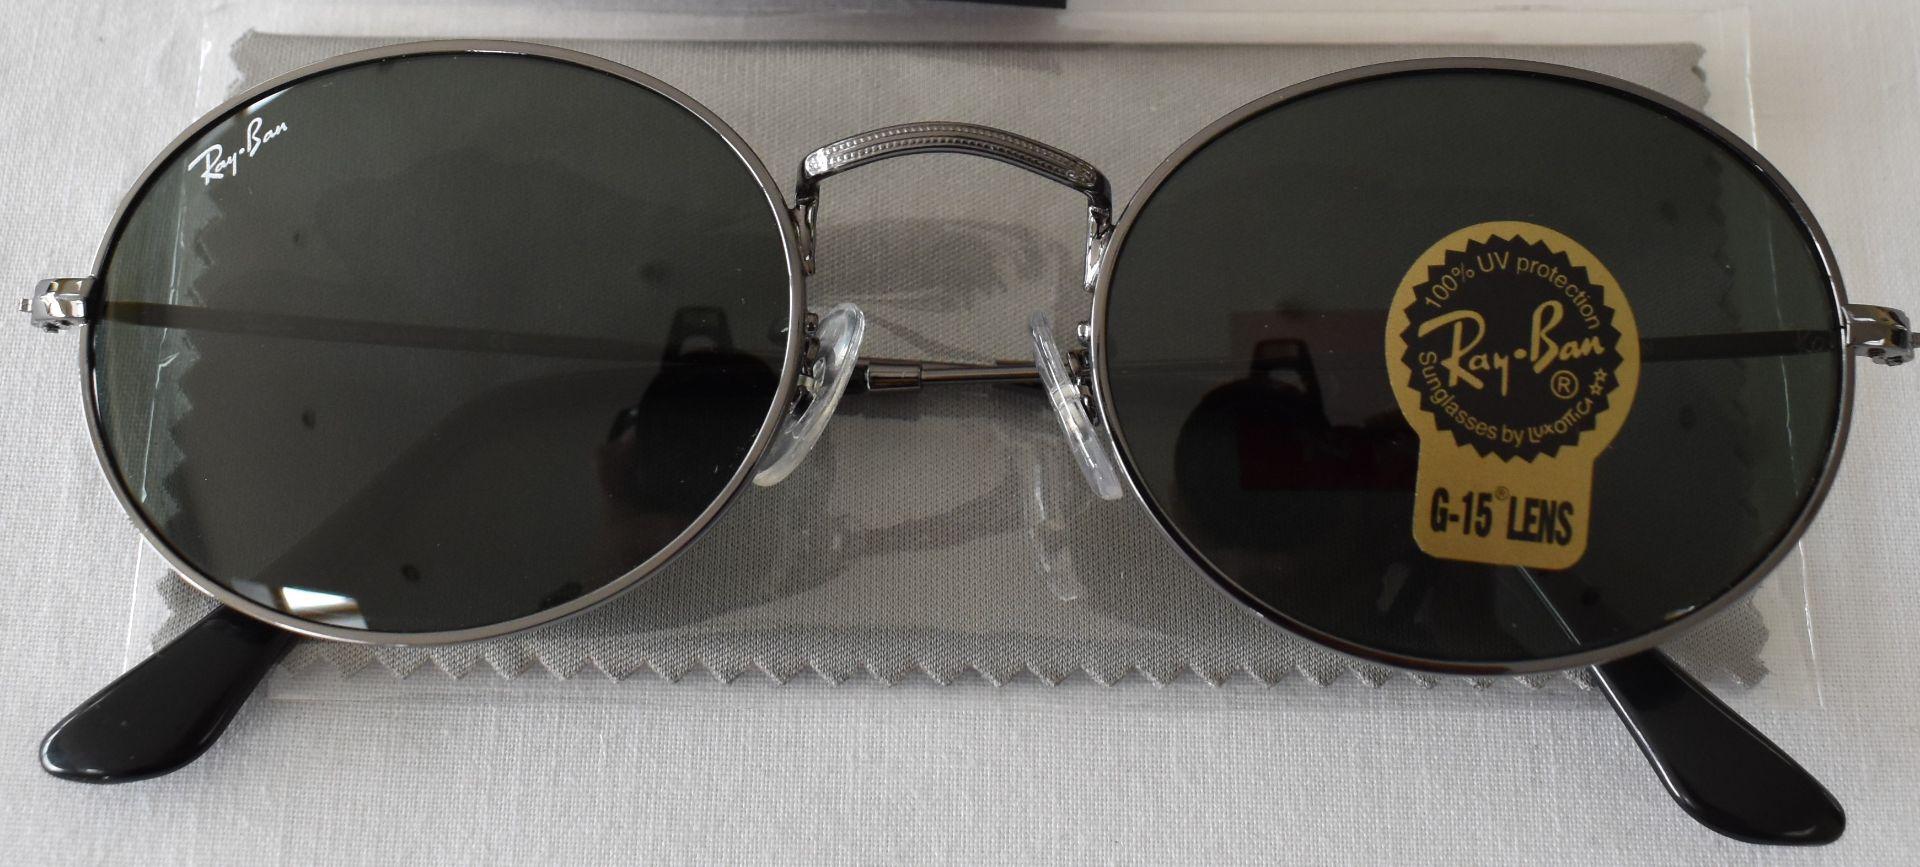 Ray Ban Sunglasses ORB3547N 004 *3N - Image 2 of 3